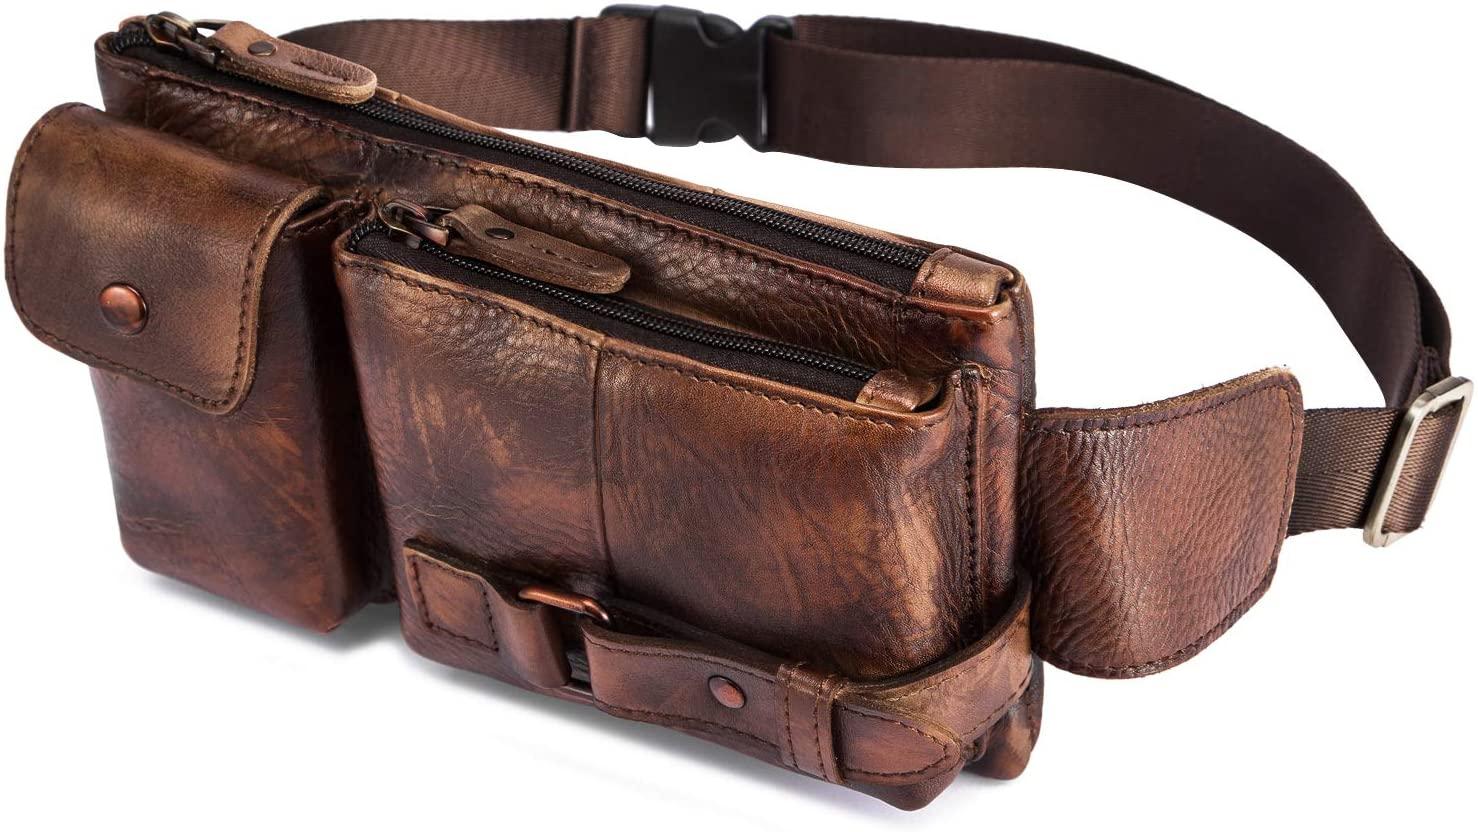 Le'aokuu Mens Genuine Leather Travel Chest Sling Bag Hip Bum Fanny Belt Waist Pack bag (The 8135 Brown)